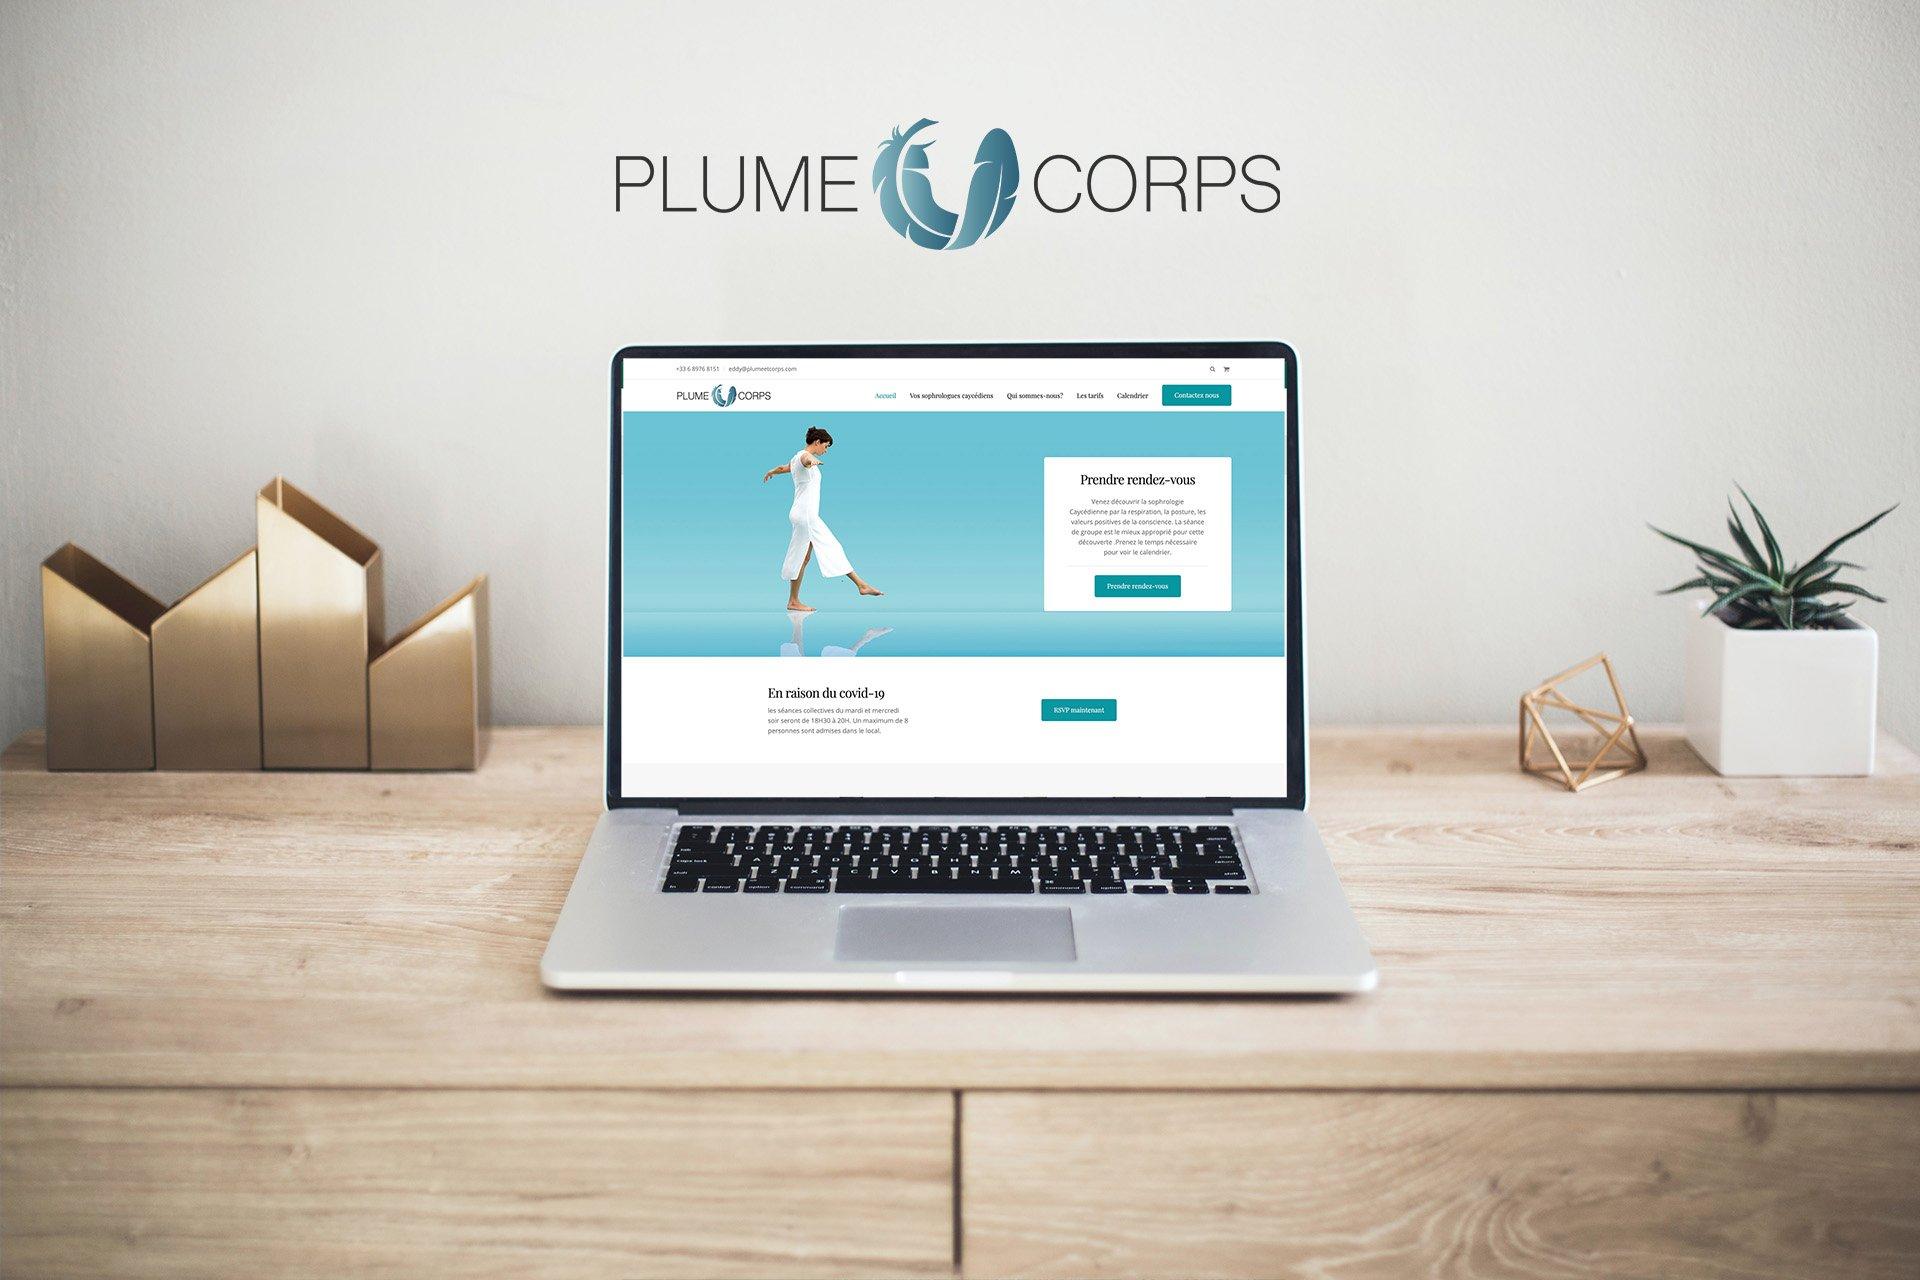 Plume & Corps website